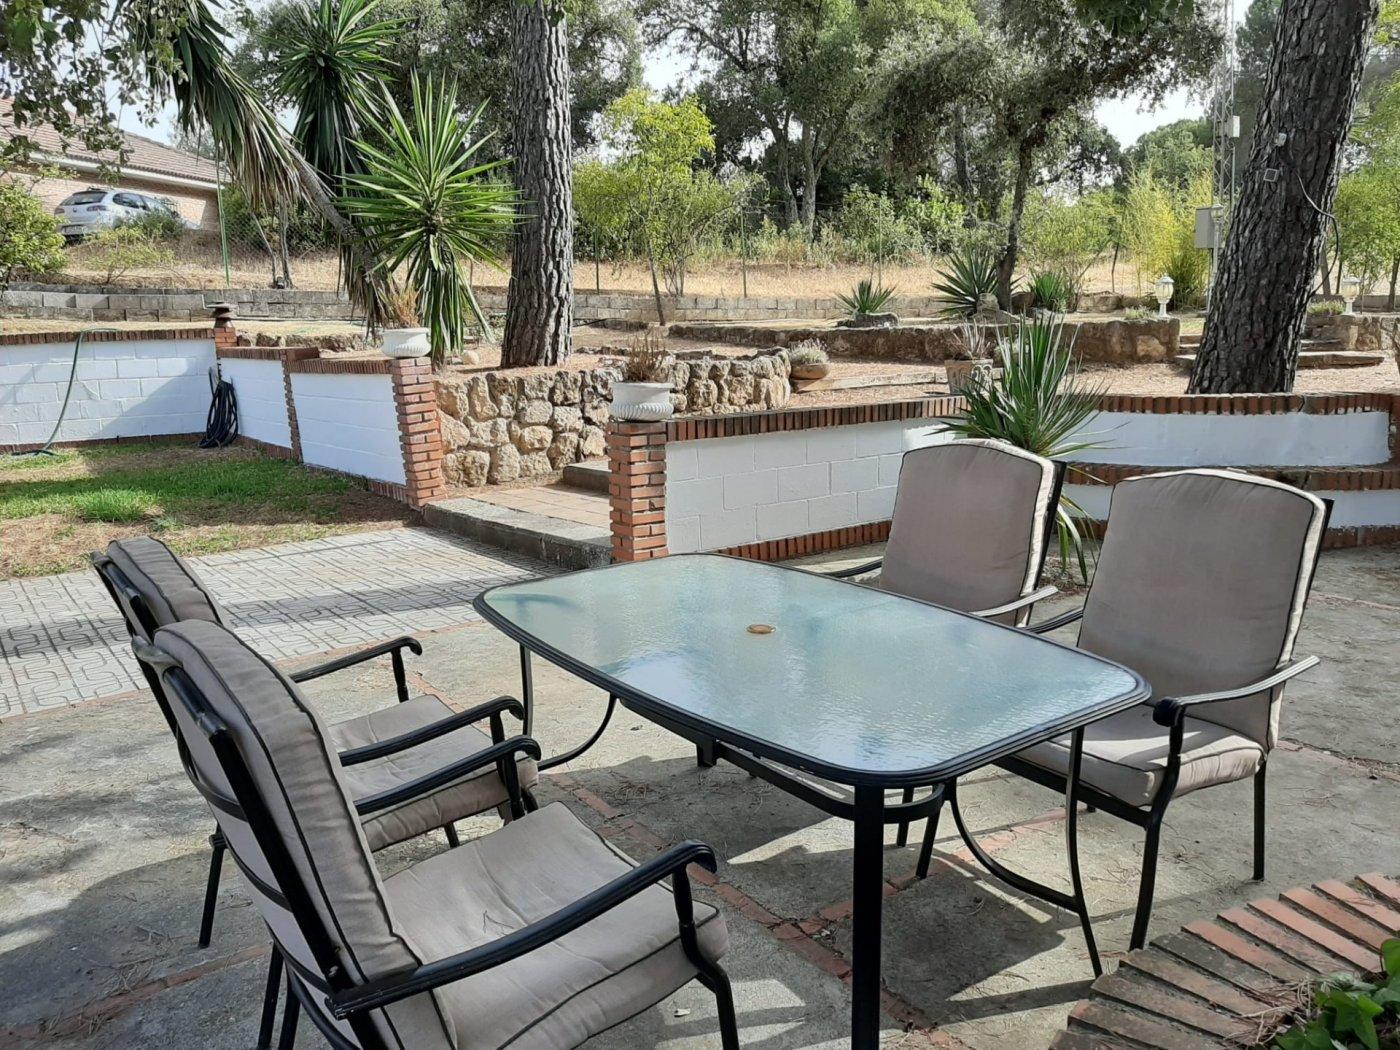 Estupenda casa con piscina propia en zona de assuan- las jaras-cÓrdoba. - imagenInmueble6